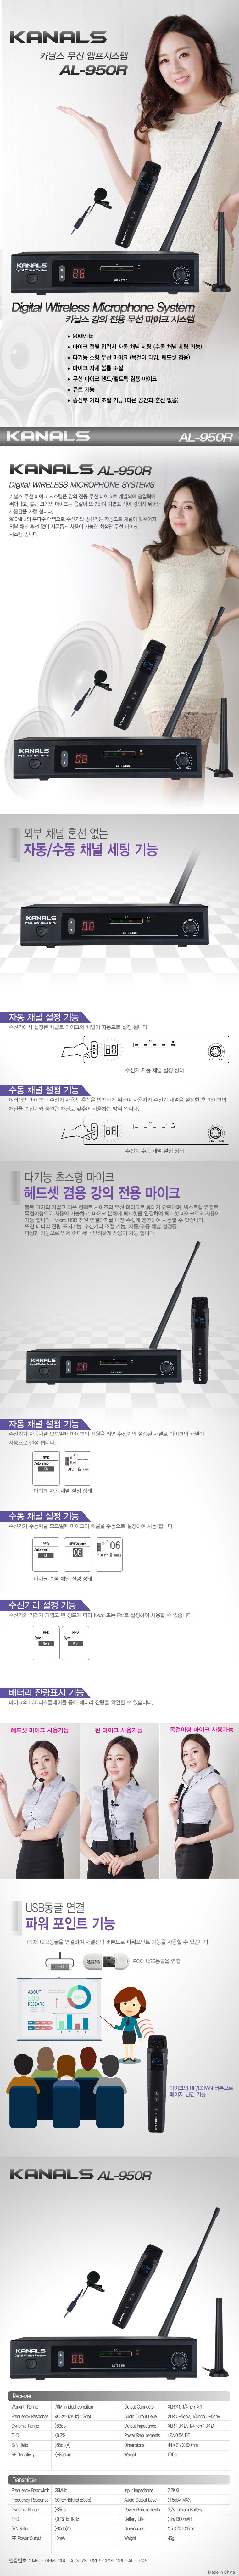 AL-950R-SANGSE.jpg